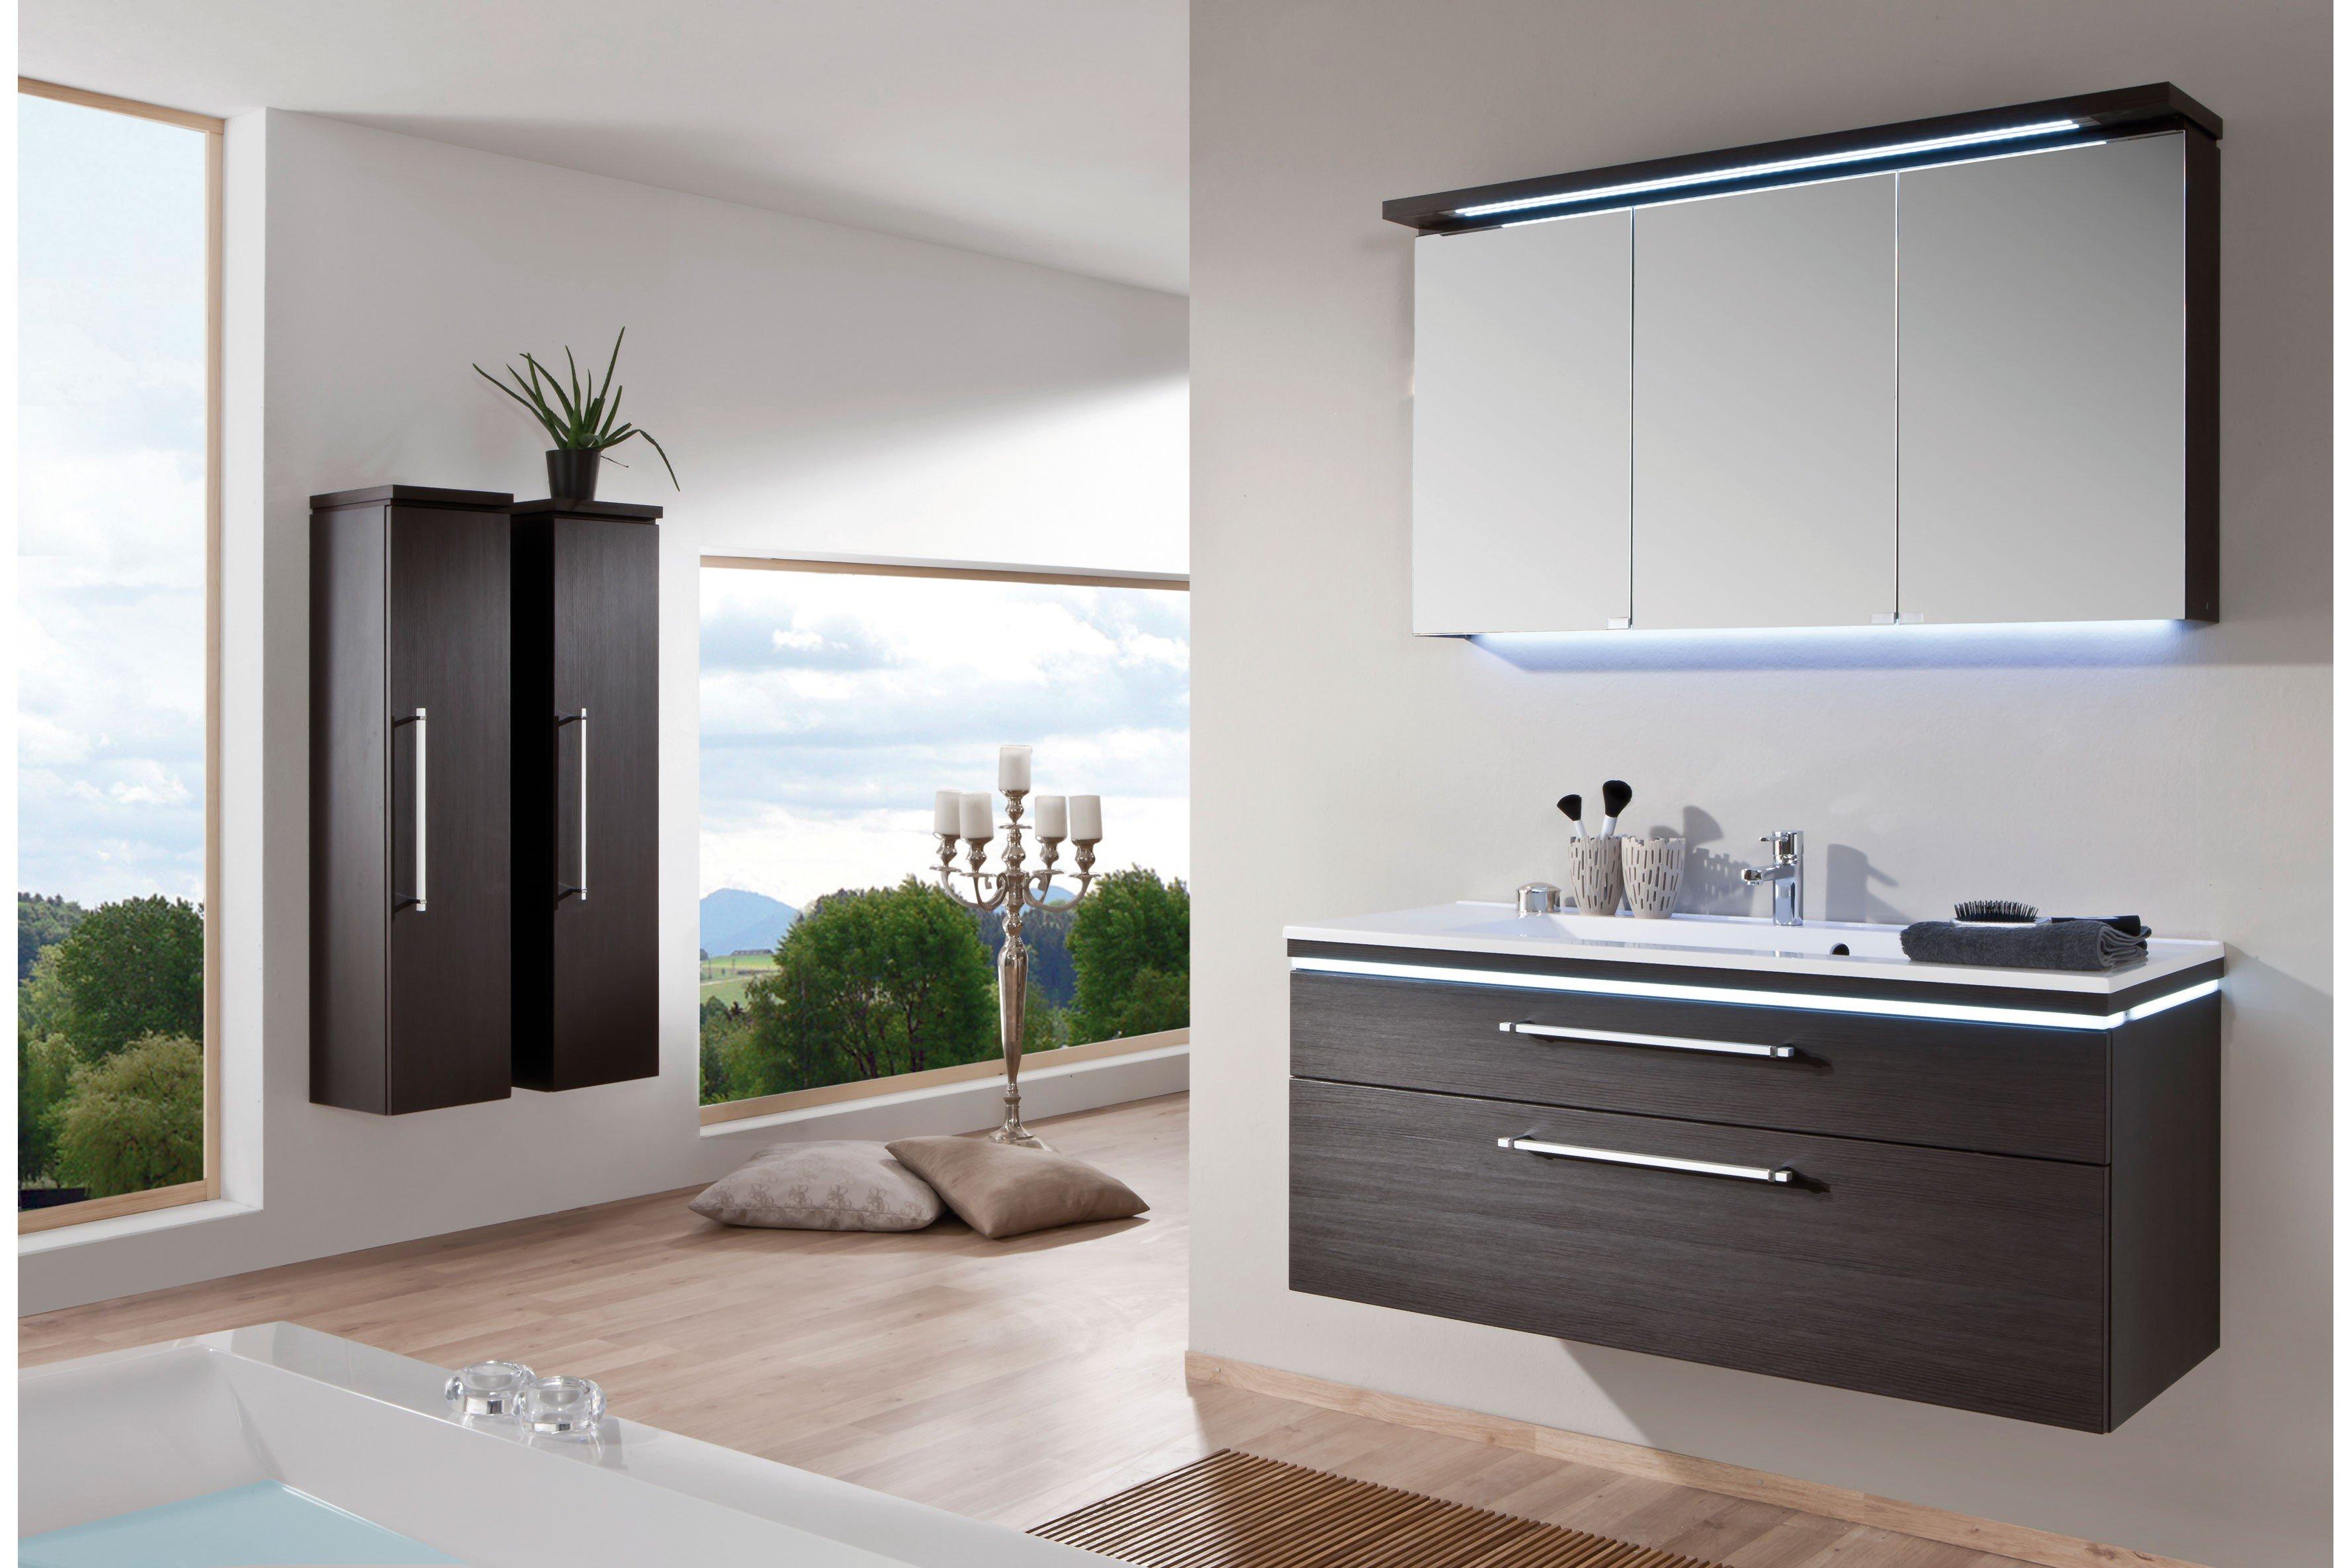 badm bel puris cool line preise reuniecollegenoetsele. Black Bedroom Furniture Sets. Home Design Ideas